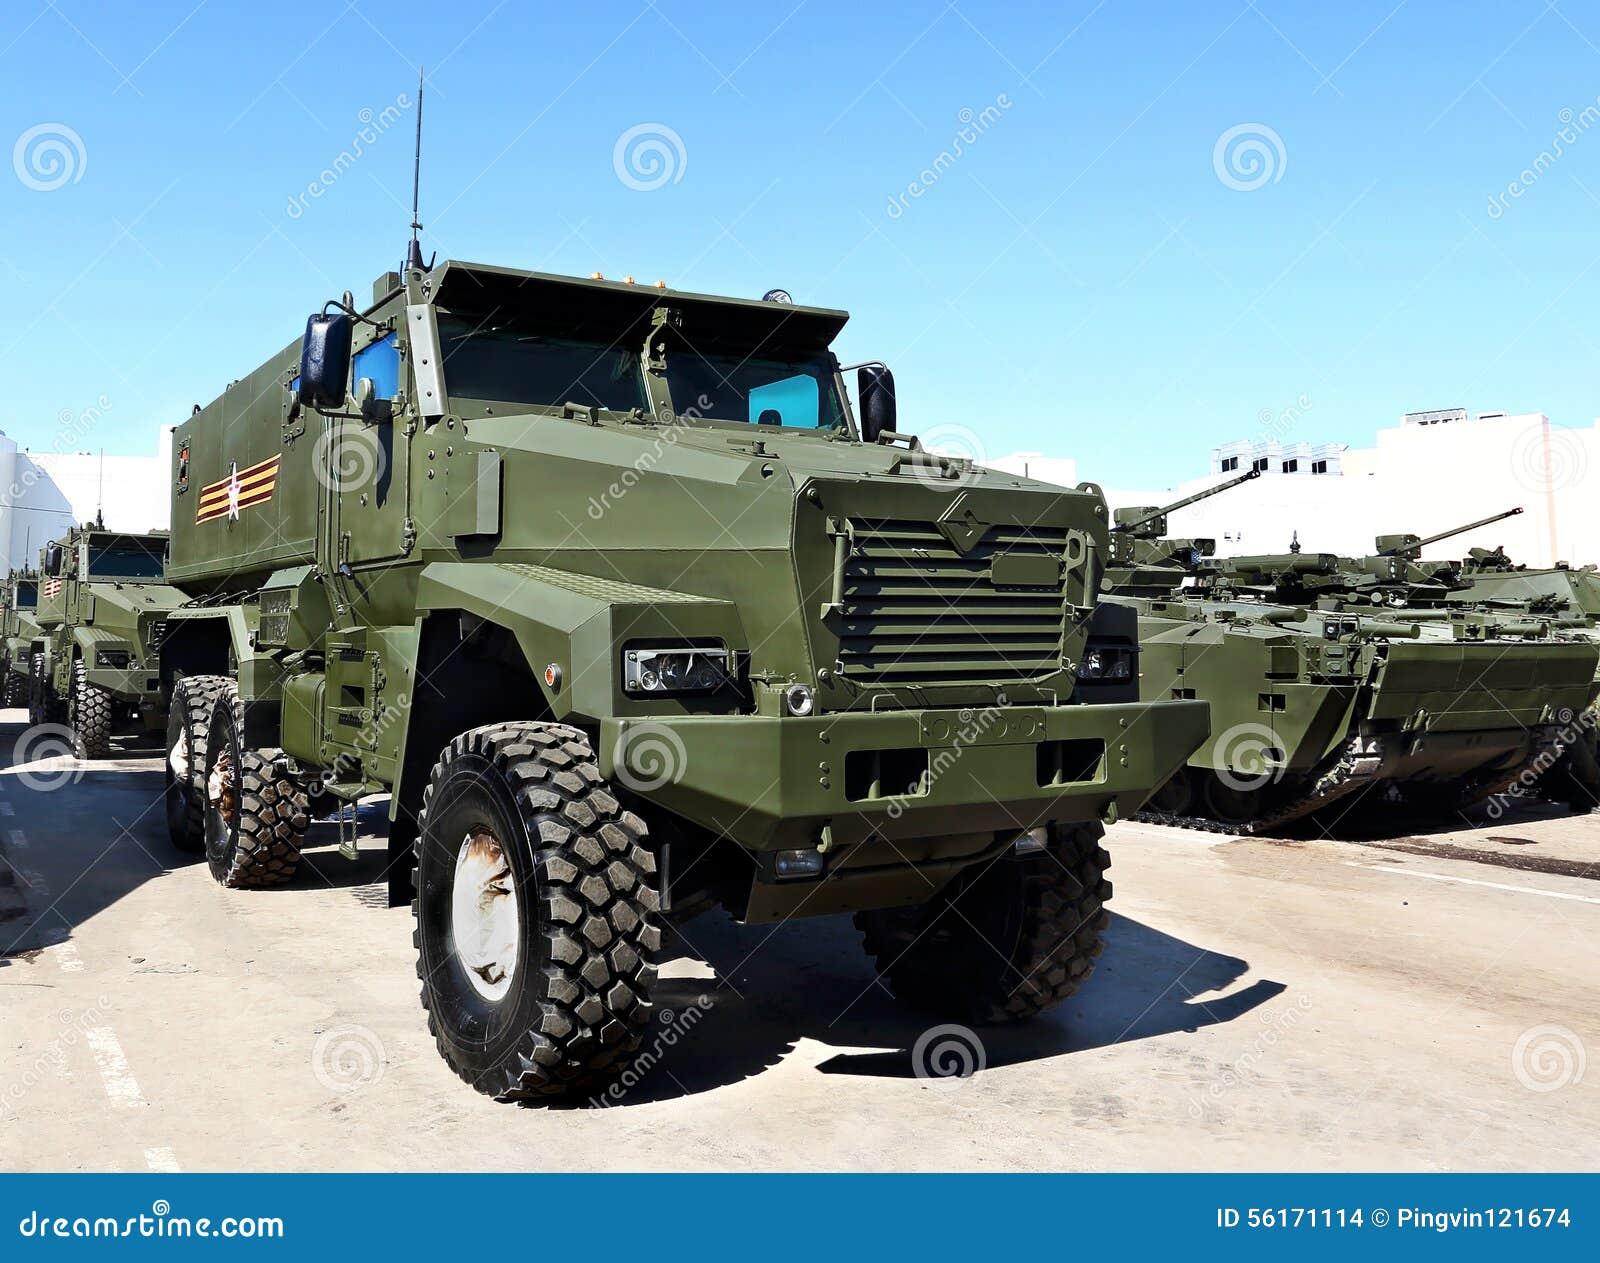 military all terrain vehicle stock illustration illustration 56171114. Black Bedroom Furniture Sets. Home Design Ideas